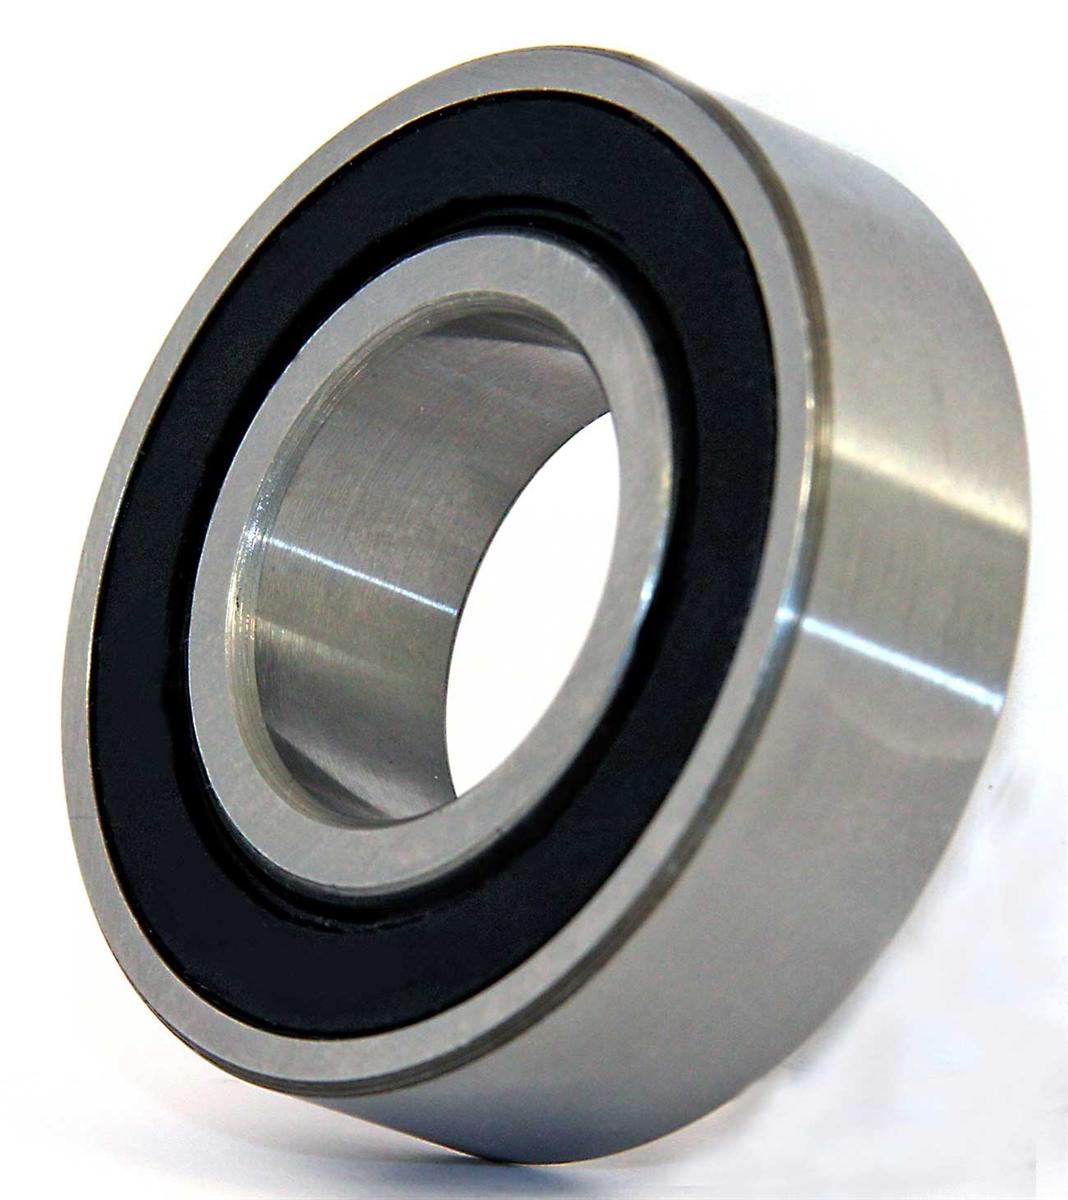 6806 4PCS POM Precision Plastic Ball Bearing Nylon retainer Bearings 30x42x7